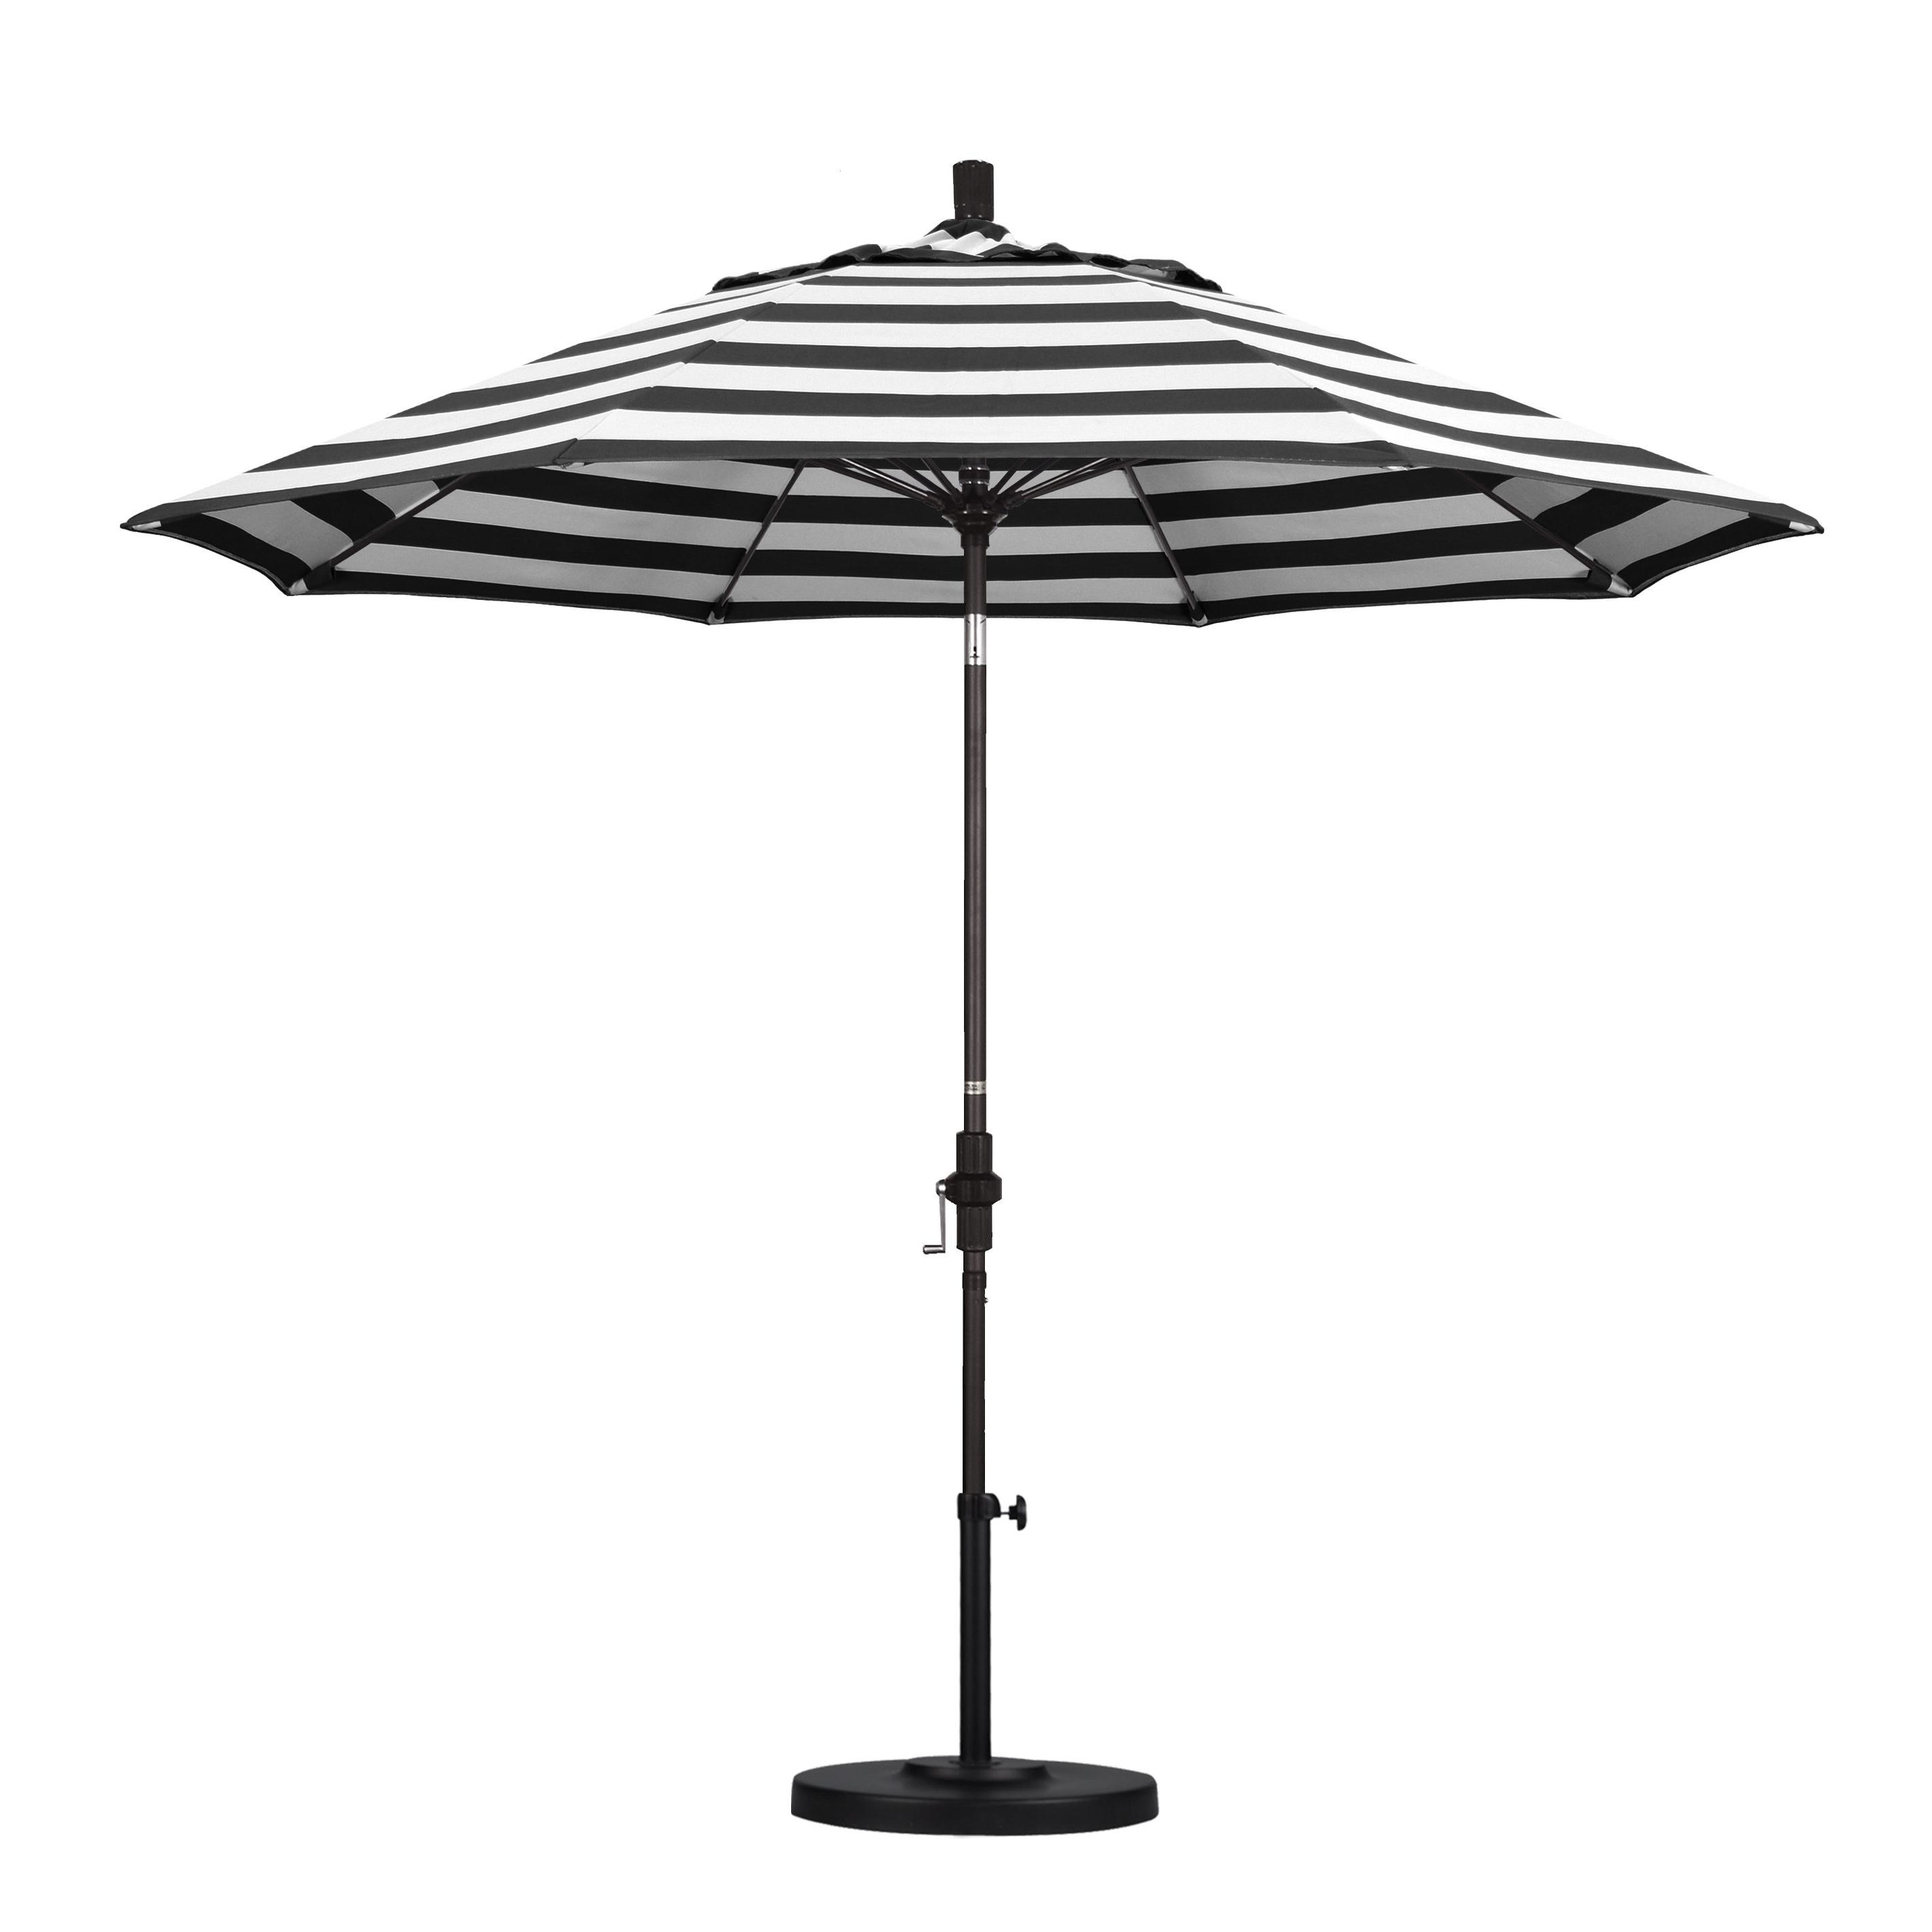 Wiebe Market Sunbrella Umbrellas For Favorite 9' Market Sunbrella Umbrella (View 15 of 20)